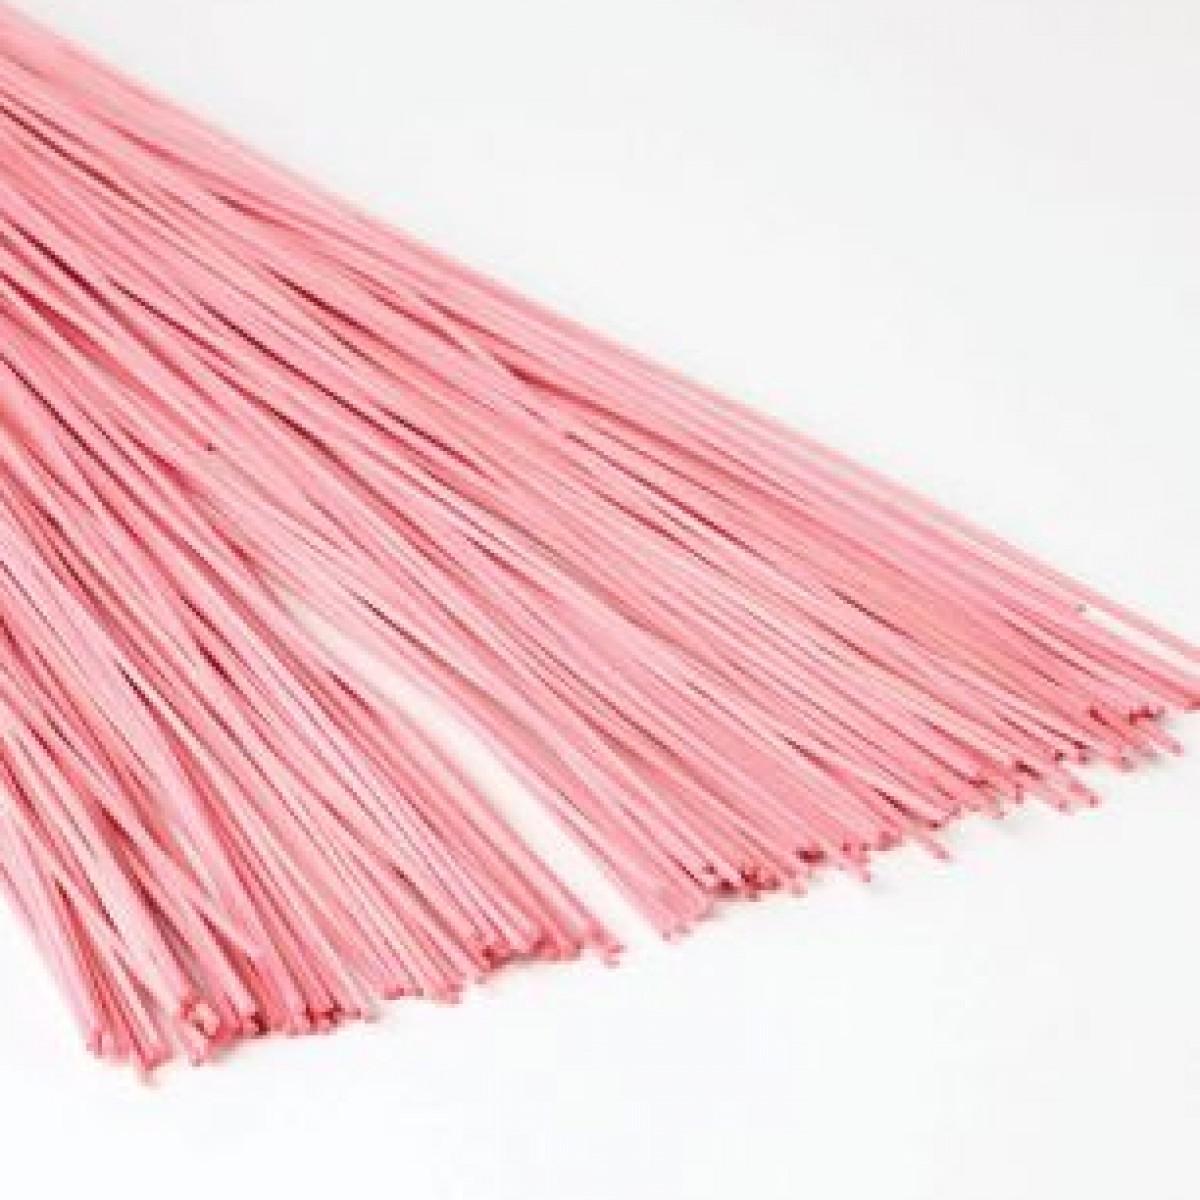 4456 Midelino Stick Pale Pink (120-150 Sticks)